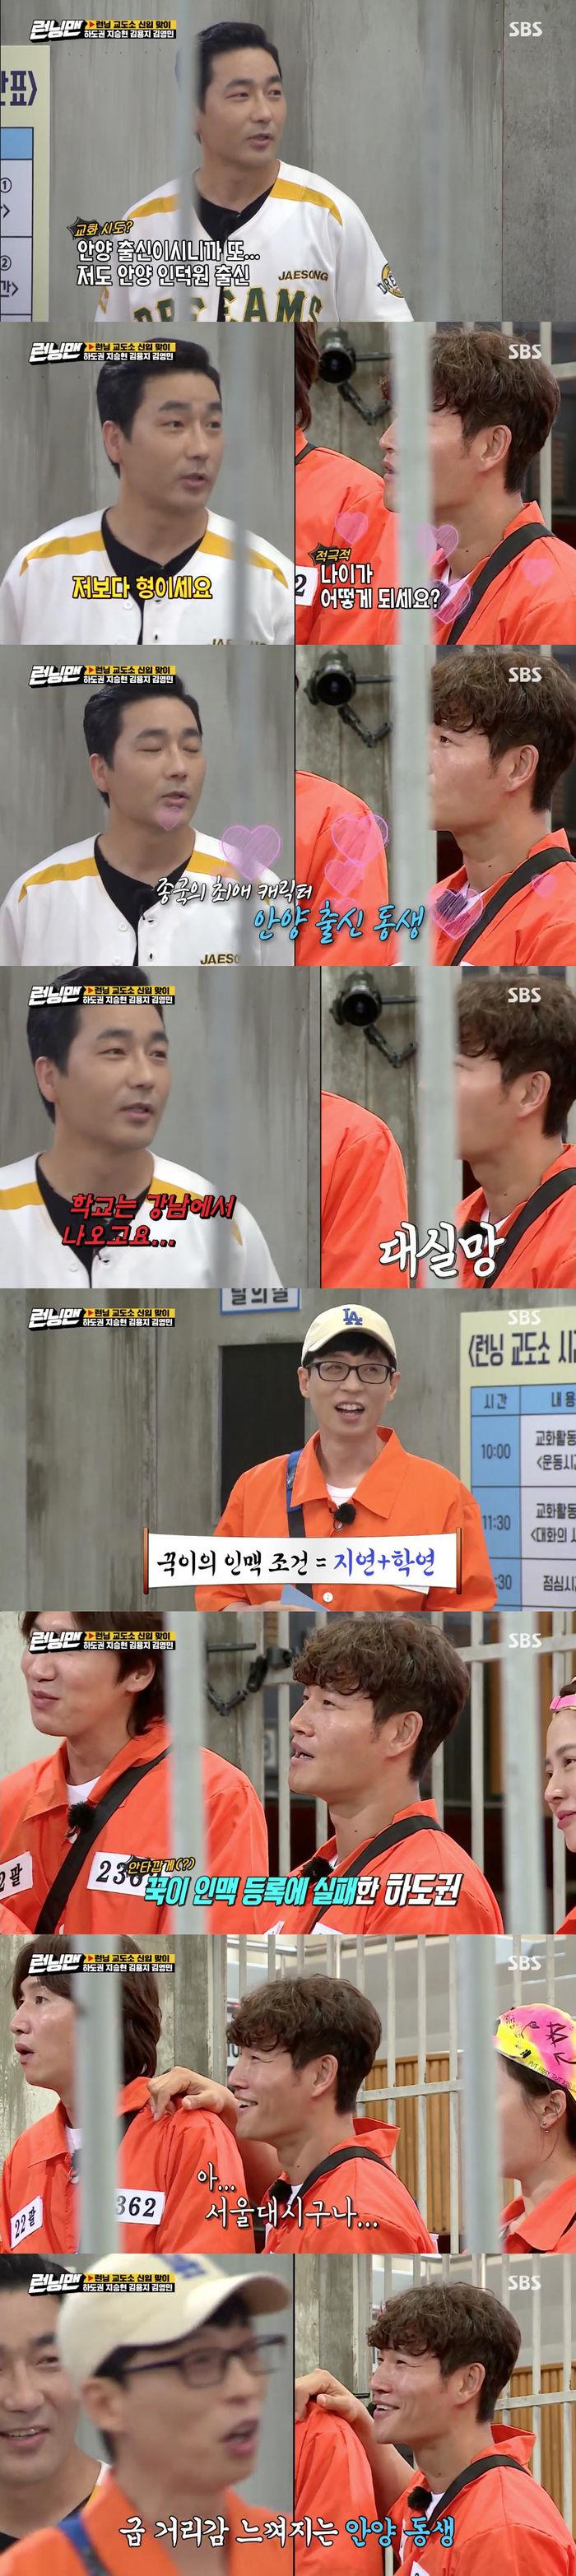 Running Man Kim Jong Kook Seoul University Anyang Station Brother Ha Do Kwon Class Distance